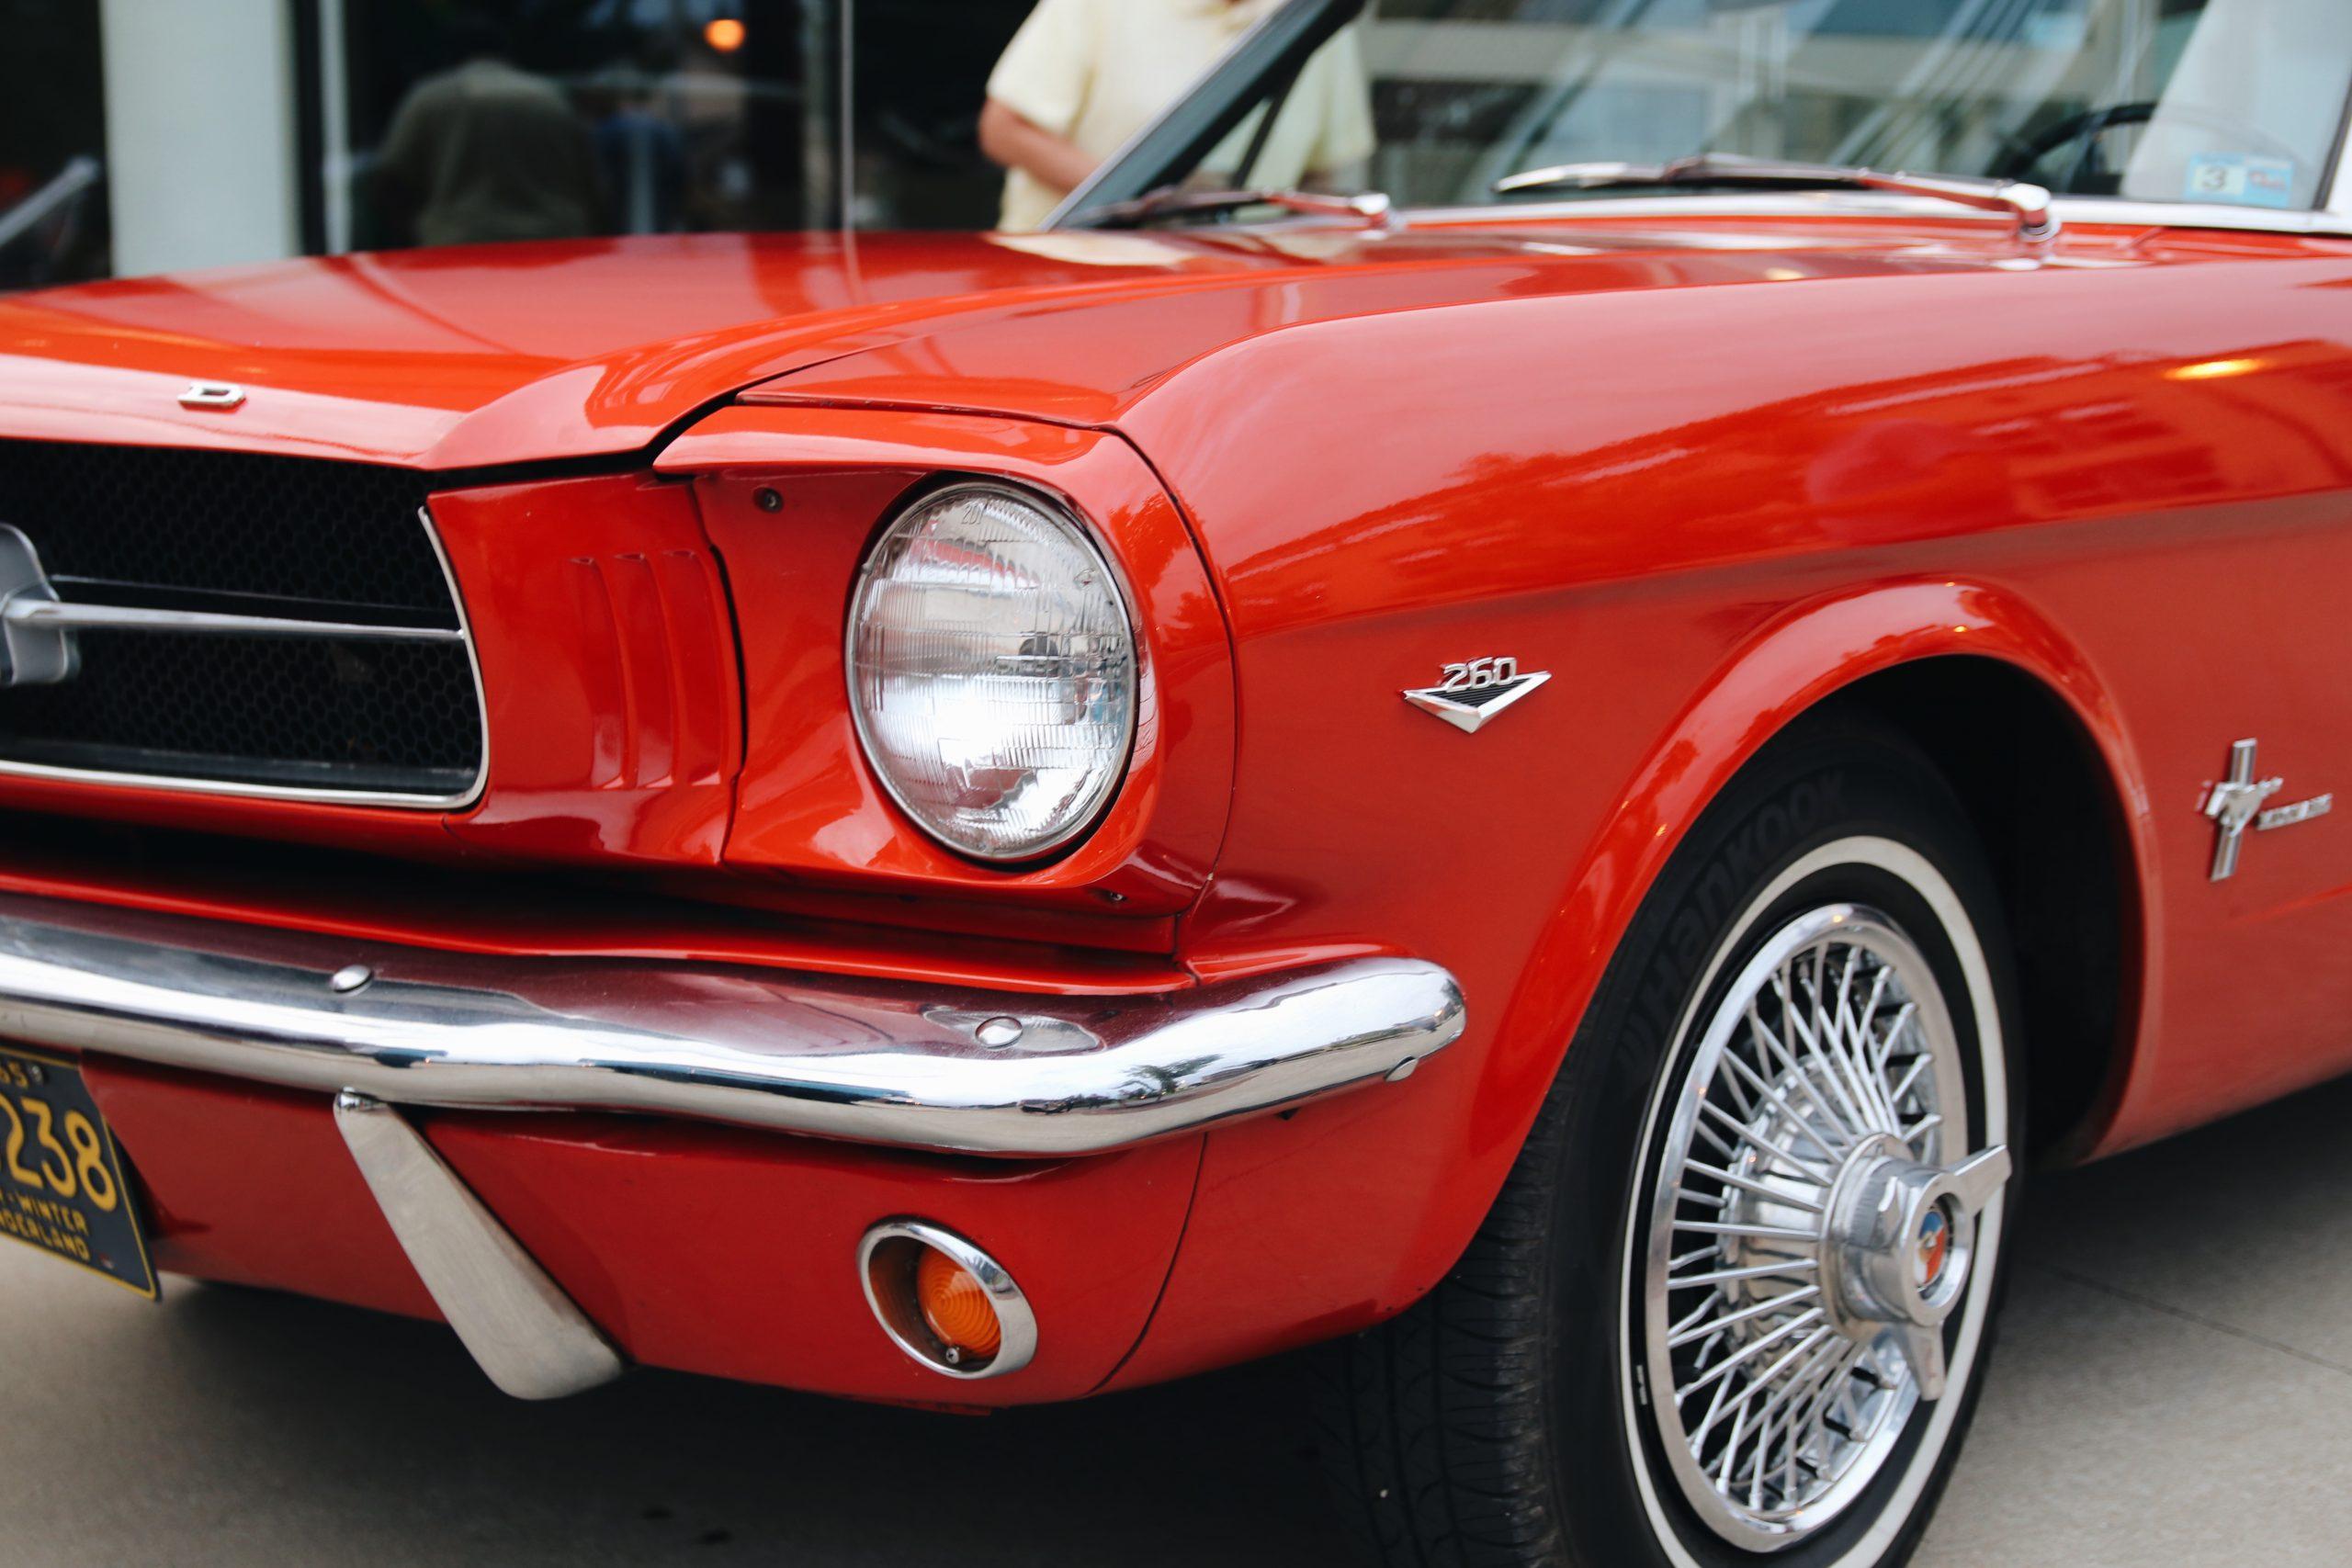 Mel Heppe Mustang headlight